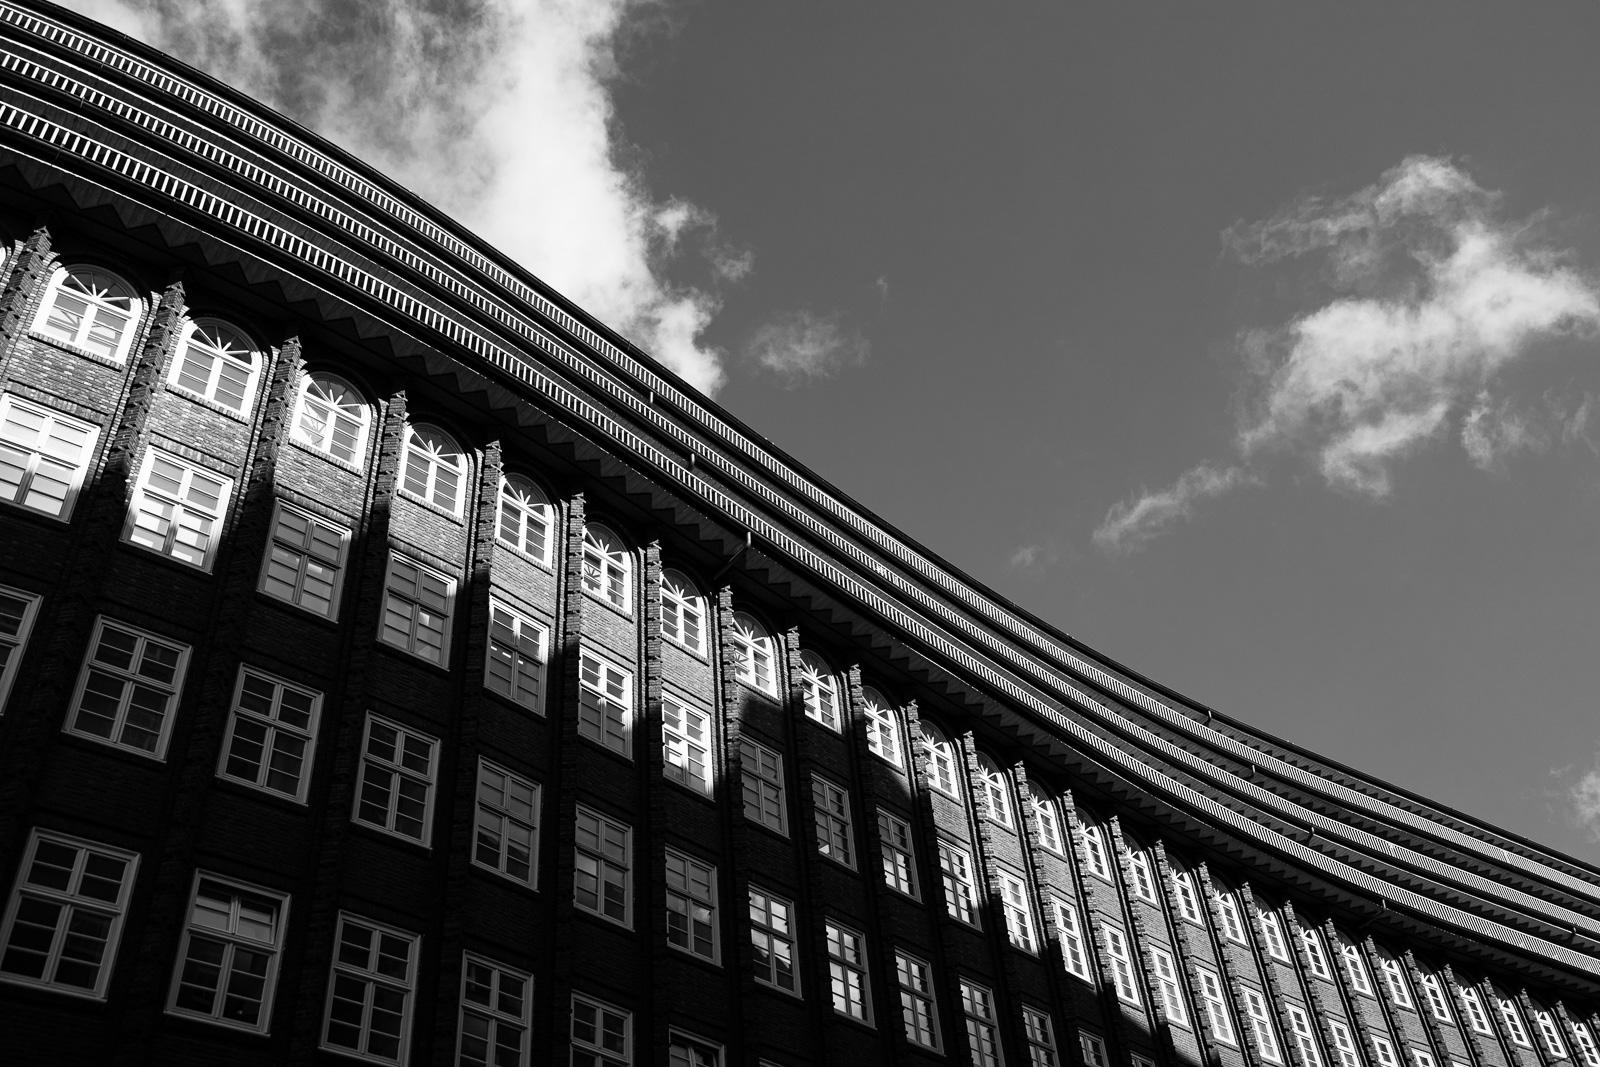 hamburg-street-sept2019-09